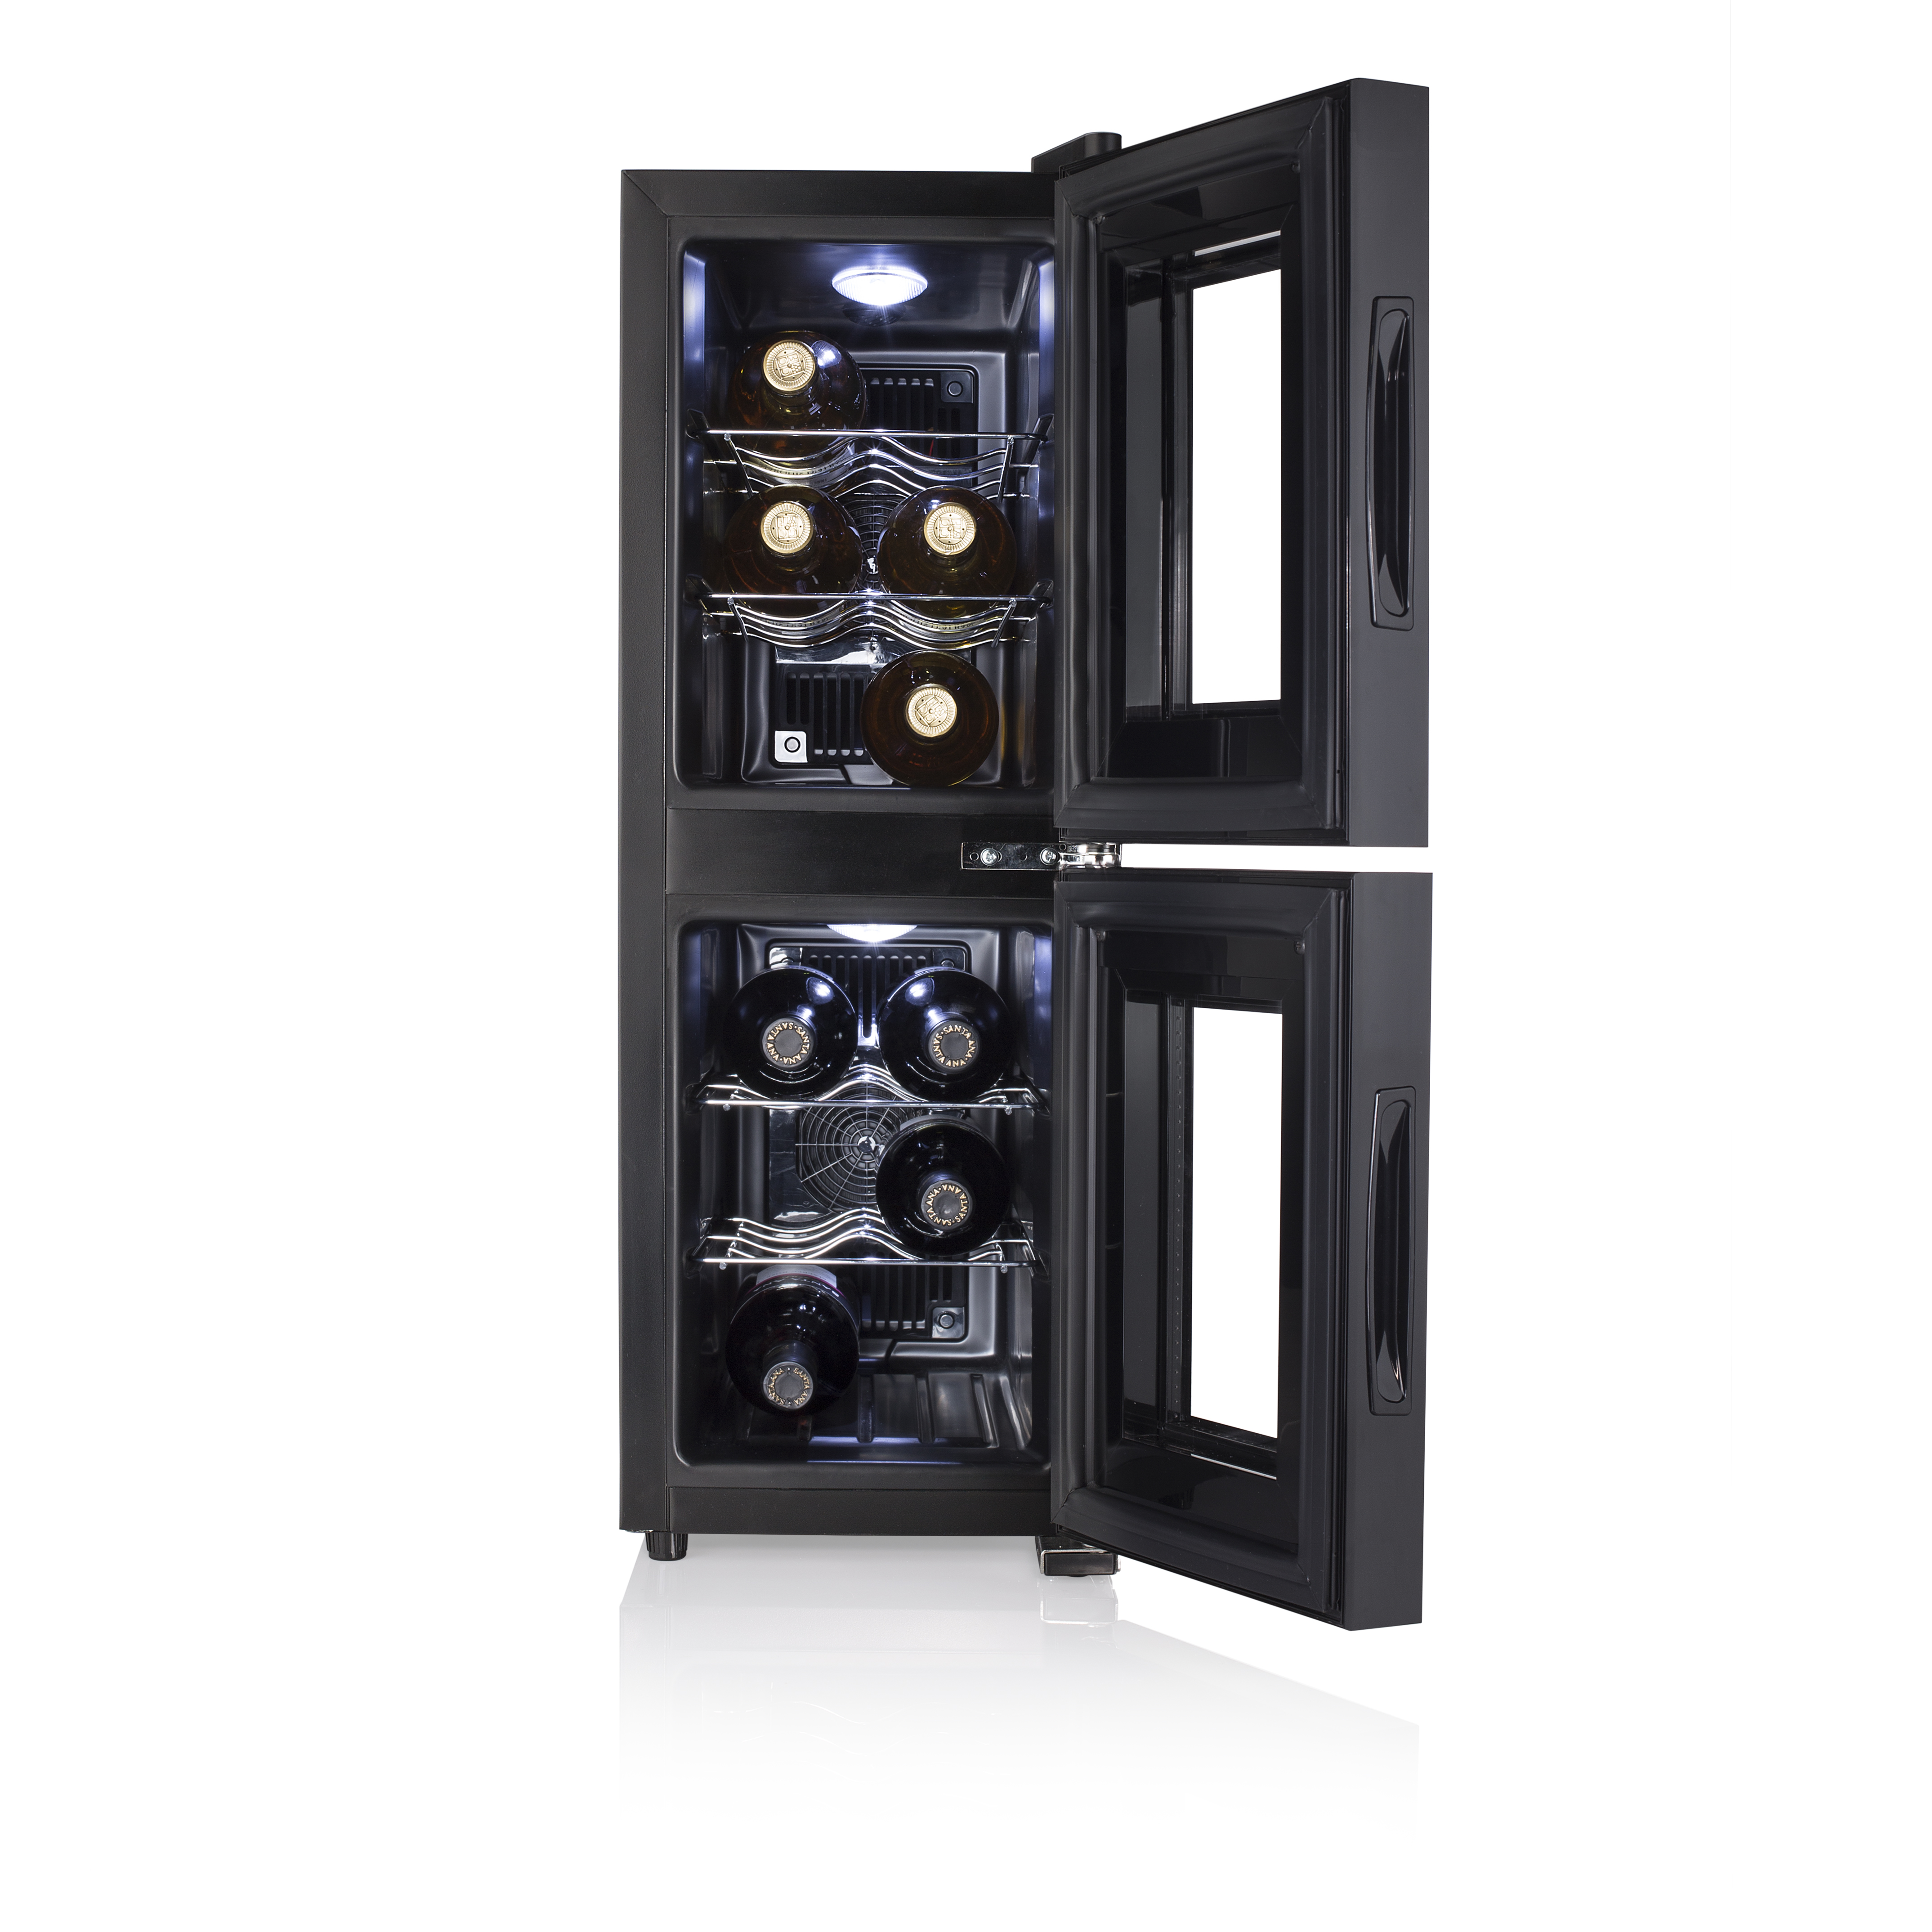 freestanding, Black, 7-18 /°C, C, Black, Black Tristar Wine Cooler Dual Zone wine coolers